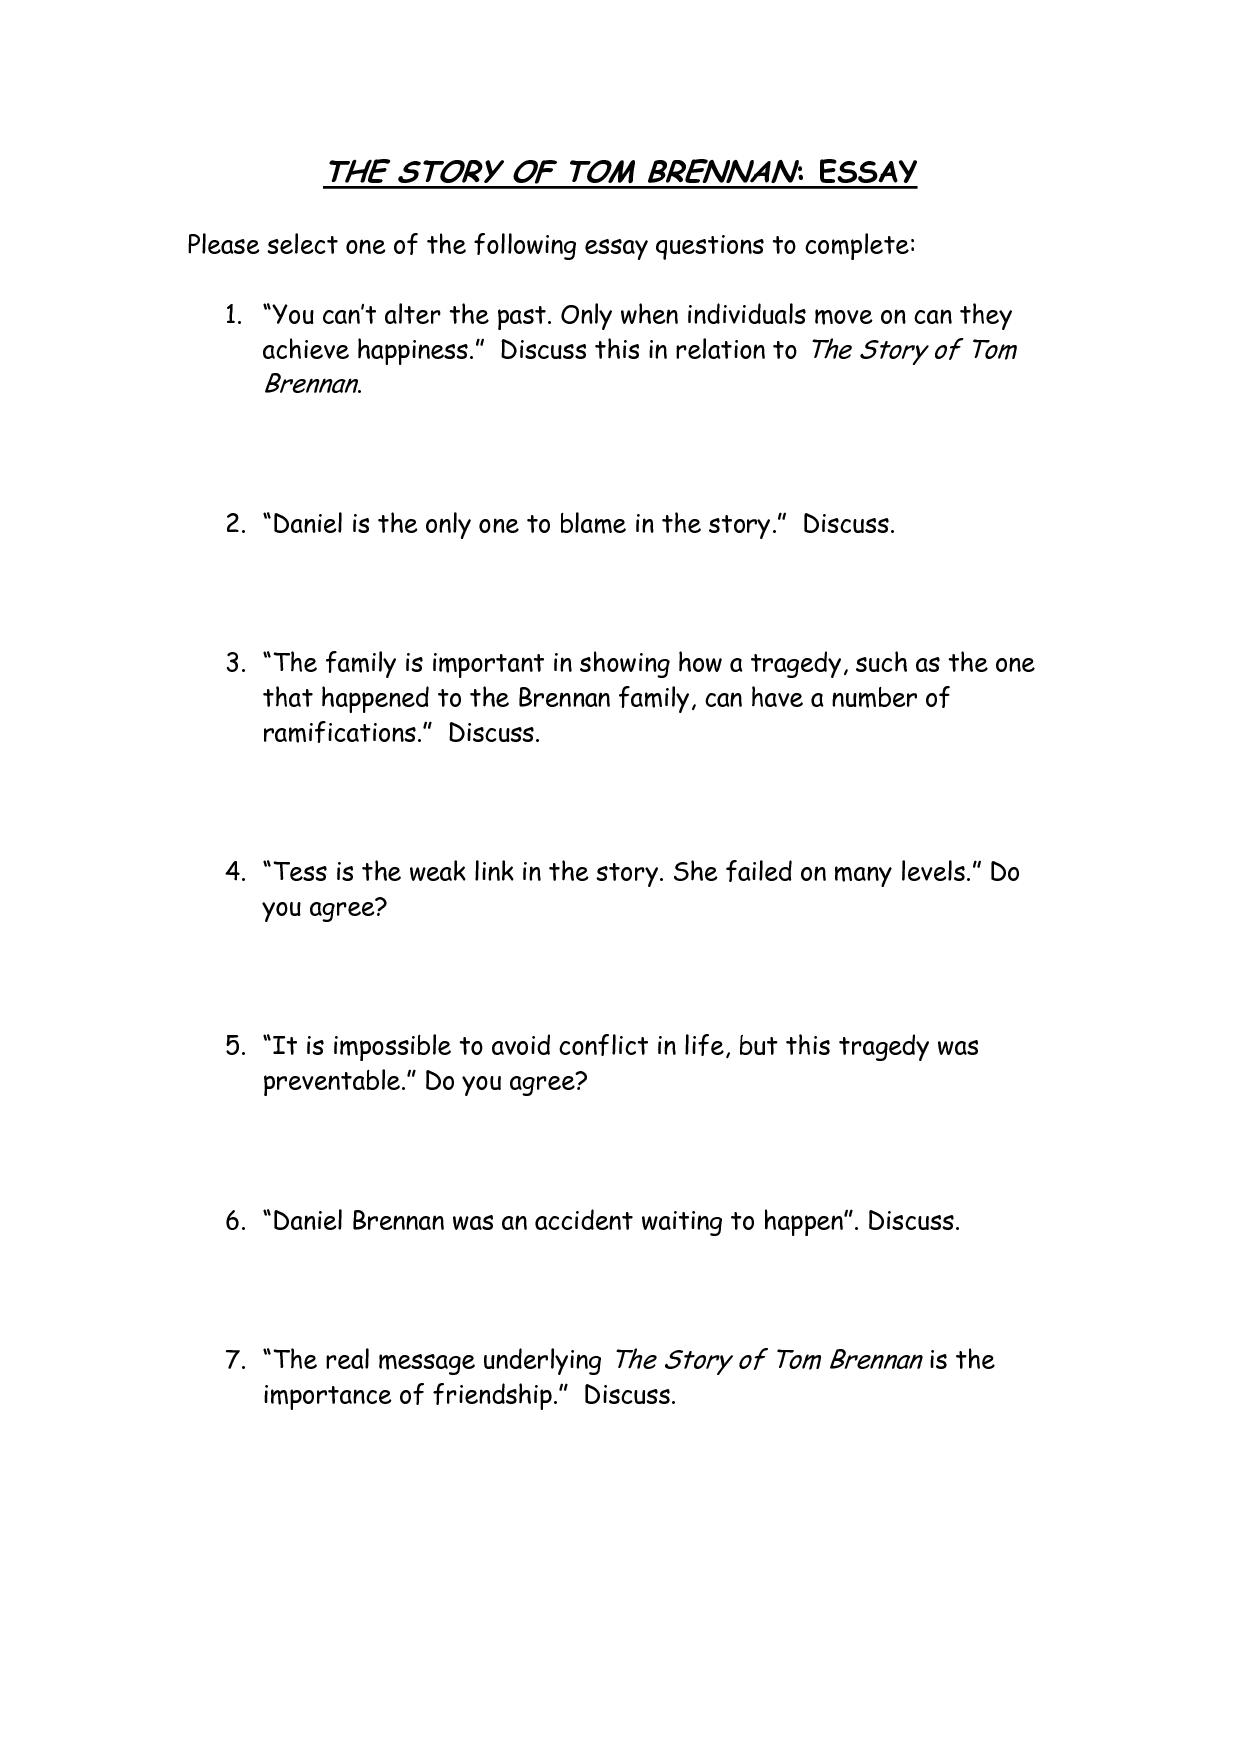 the story of tom brennan essay Into the world: the story of tom brennan related text ideas ~ into the world reading schedule tom brennan assessment task general skills sample essays edit 0 1.